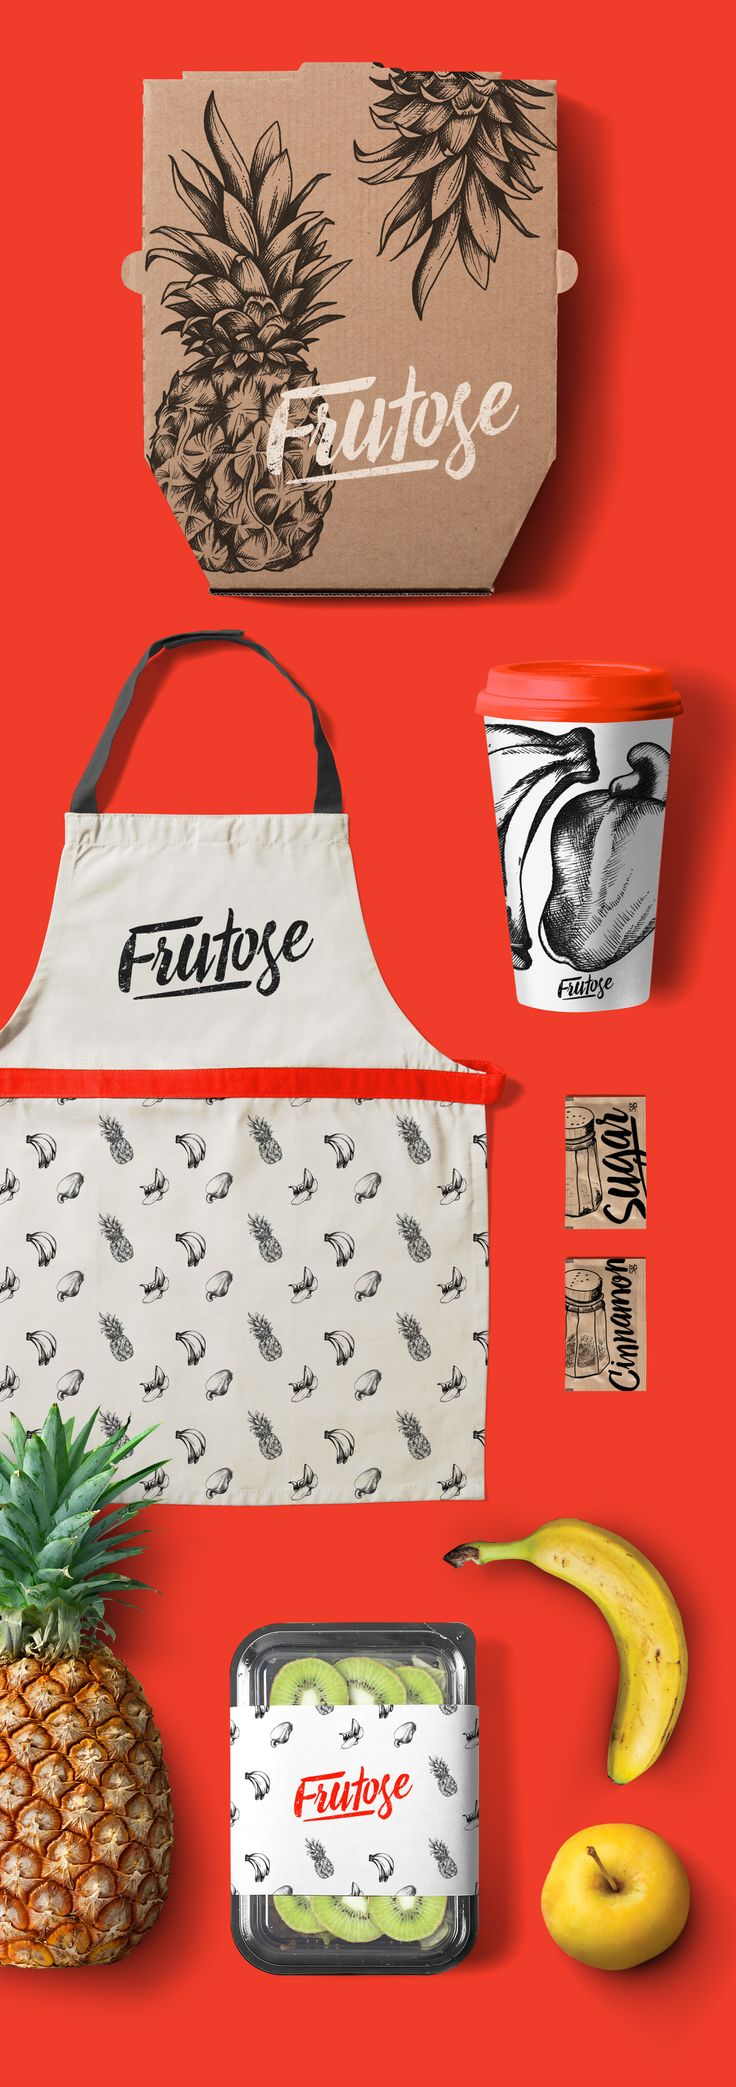 Branding design for Frutose. More